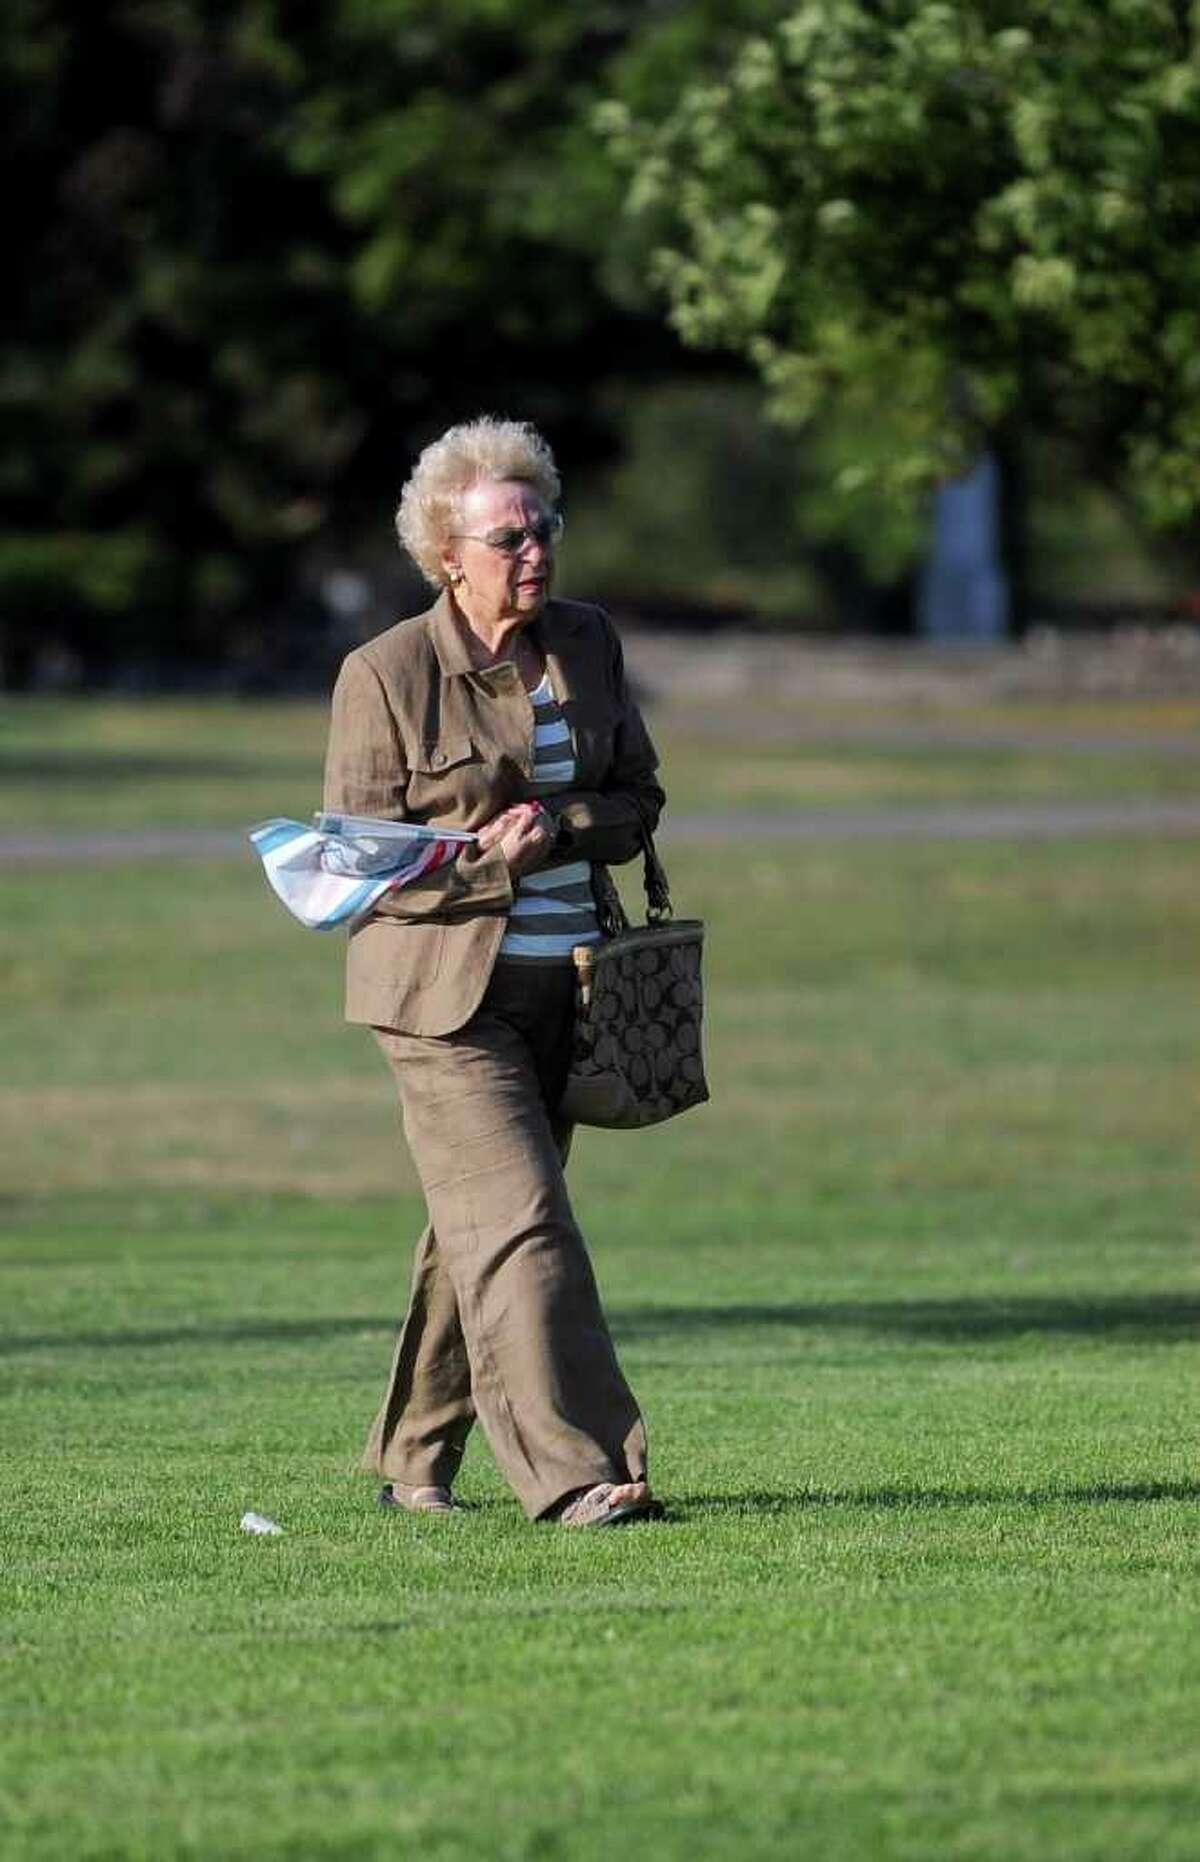 Sondra Foner of New City, NY, walks to the September 11 memorial at Sherwood Island State Park before the service Tuesday, September 7, 2010.